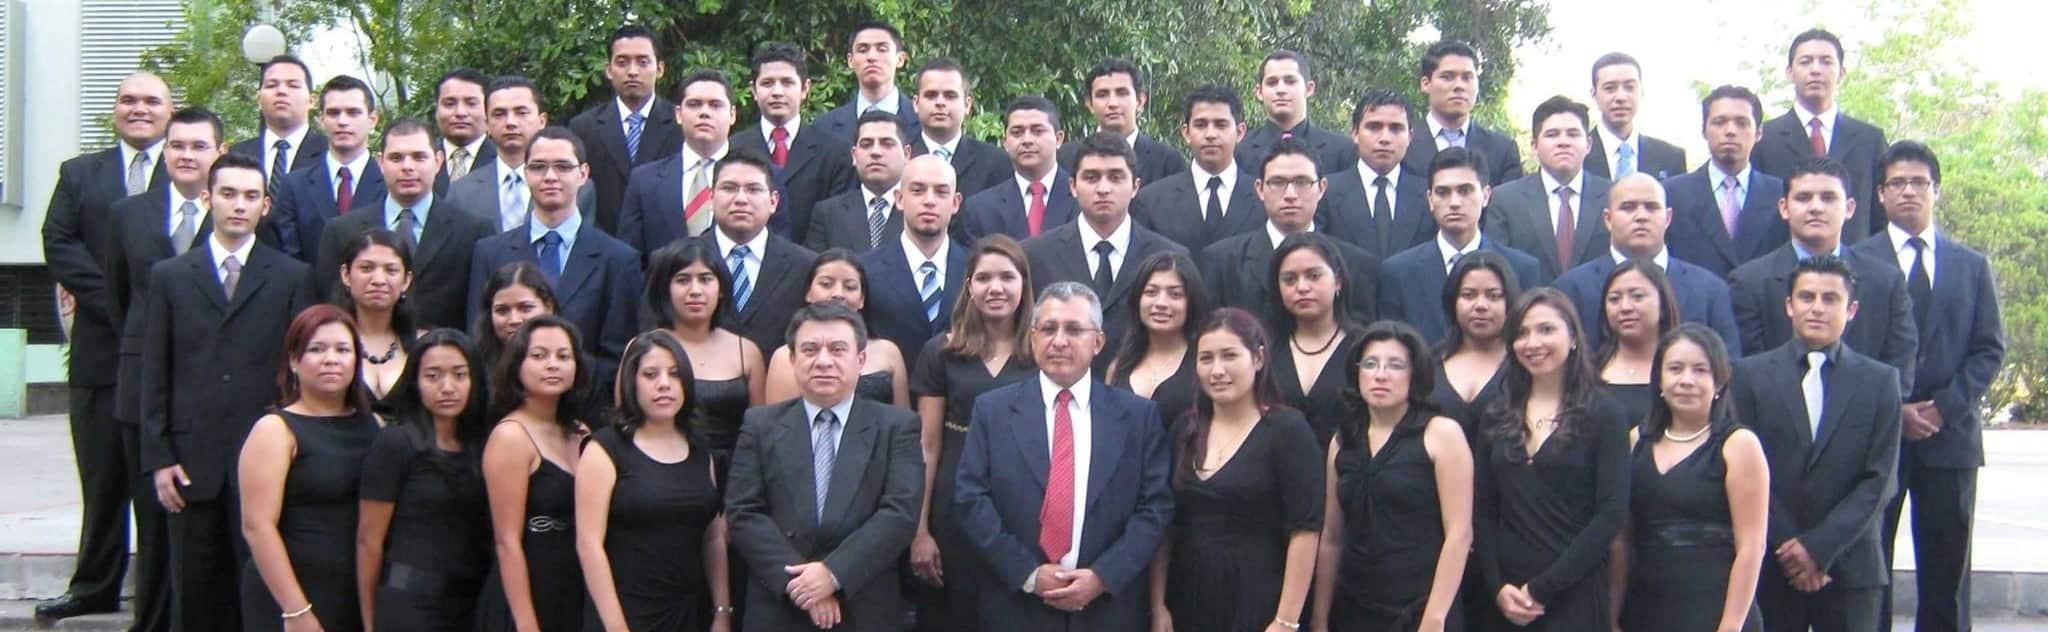 Egresados_2008